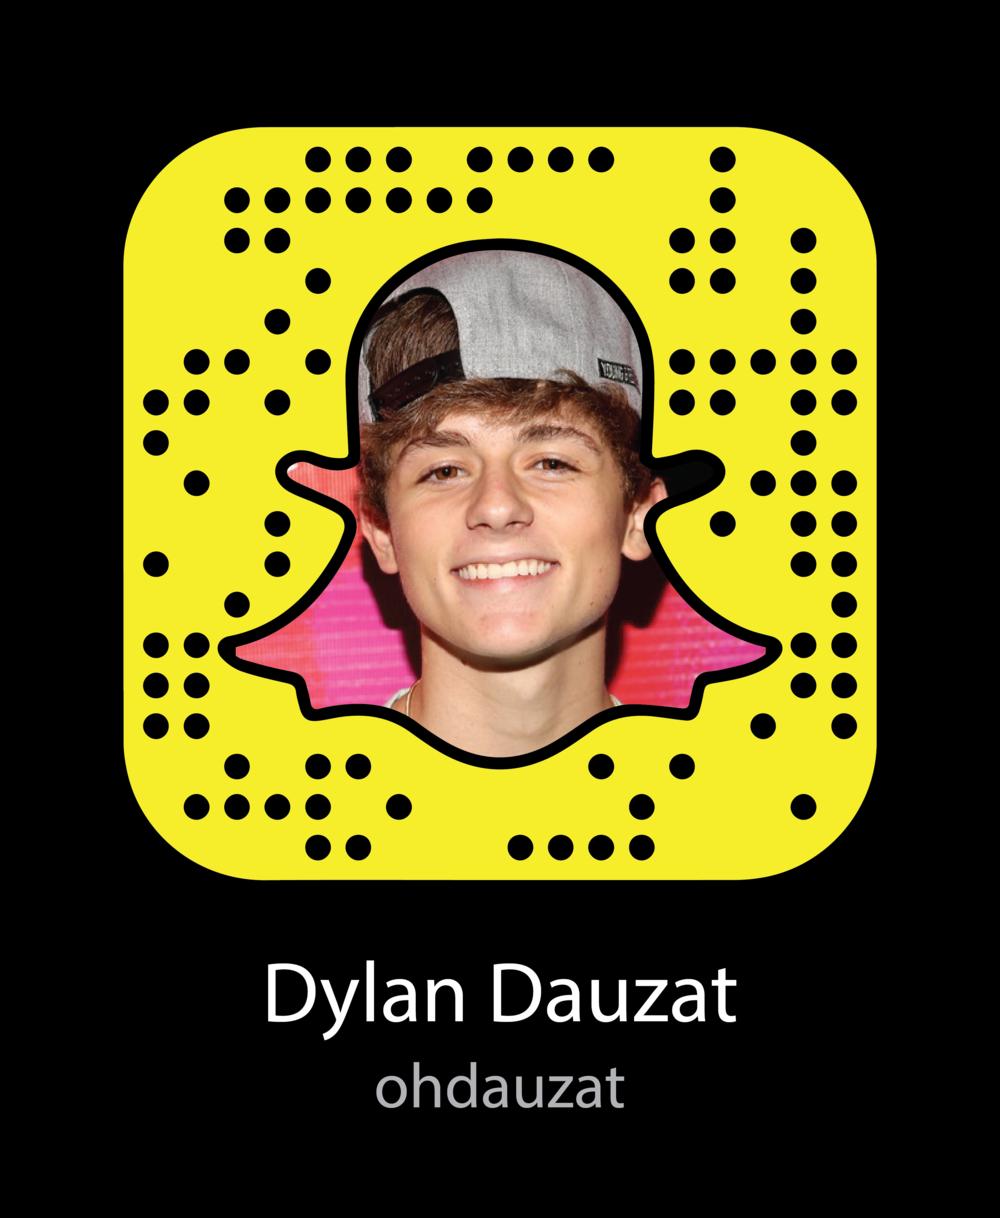 dylan-dauzat-youtube-celebrity-snapchat-snapcode